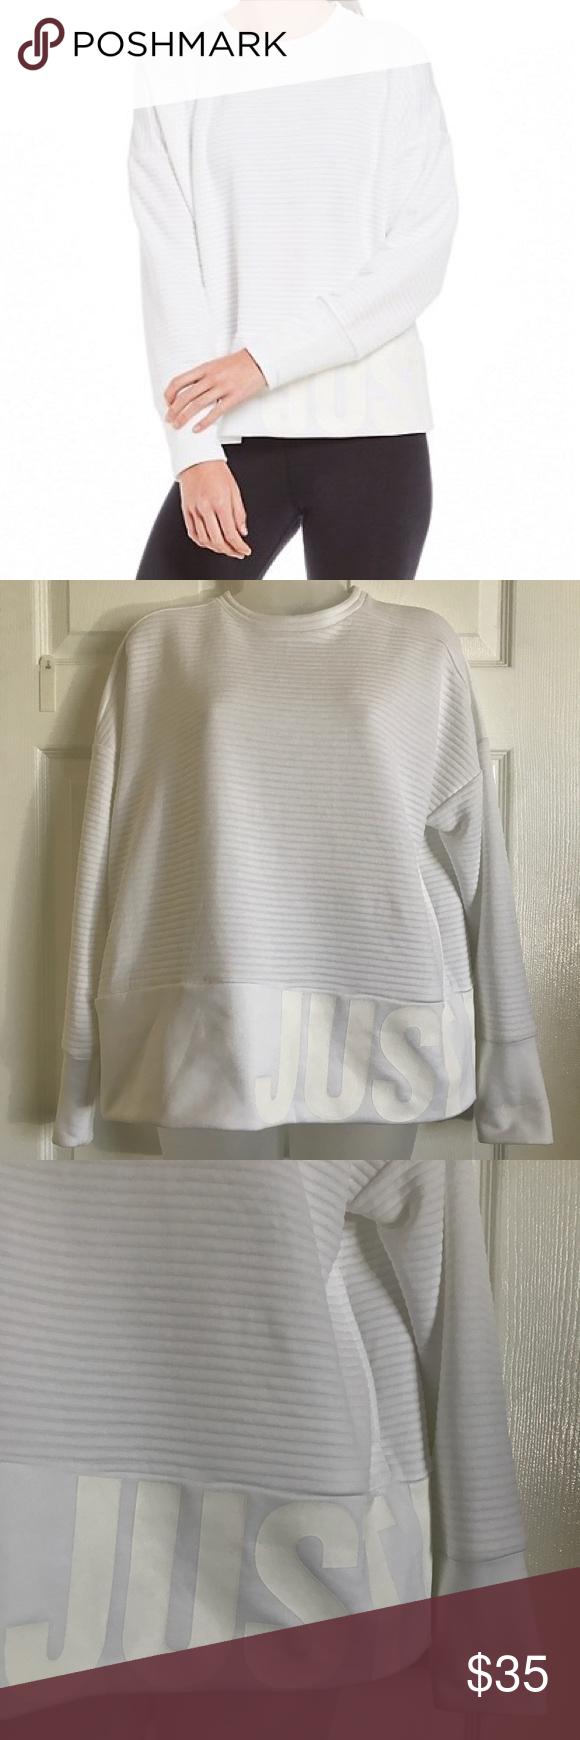 Nike Dri Fit Crewneck Sweatshirt Crew Neck Sweatshirt Clothes Design Sweatshirts [ 1740 x 580 Pixel ]